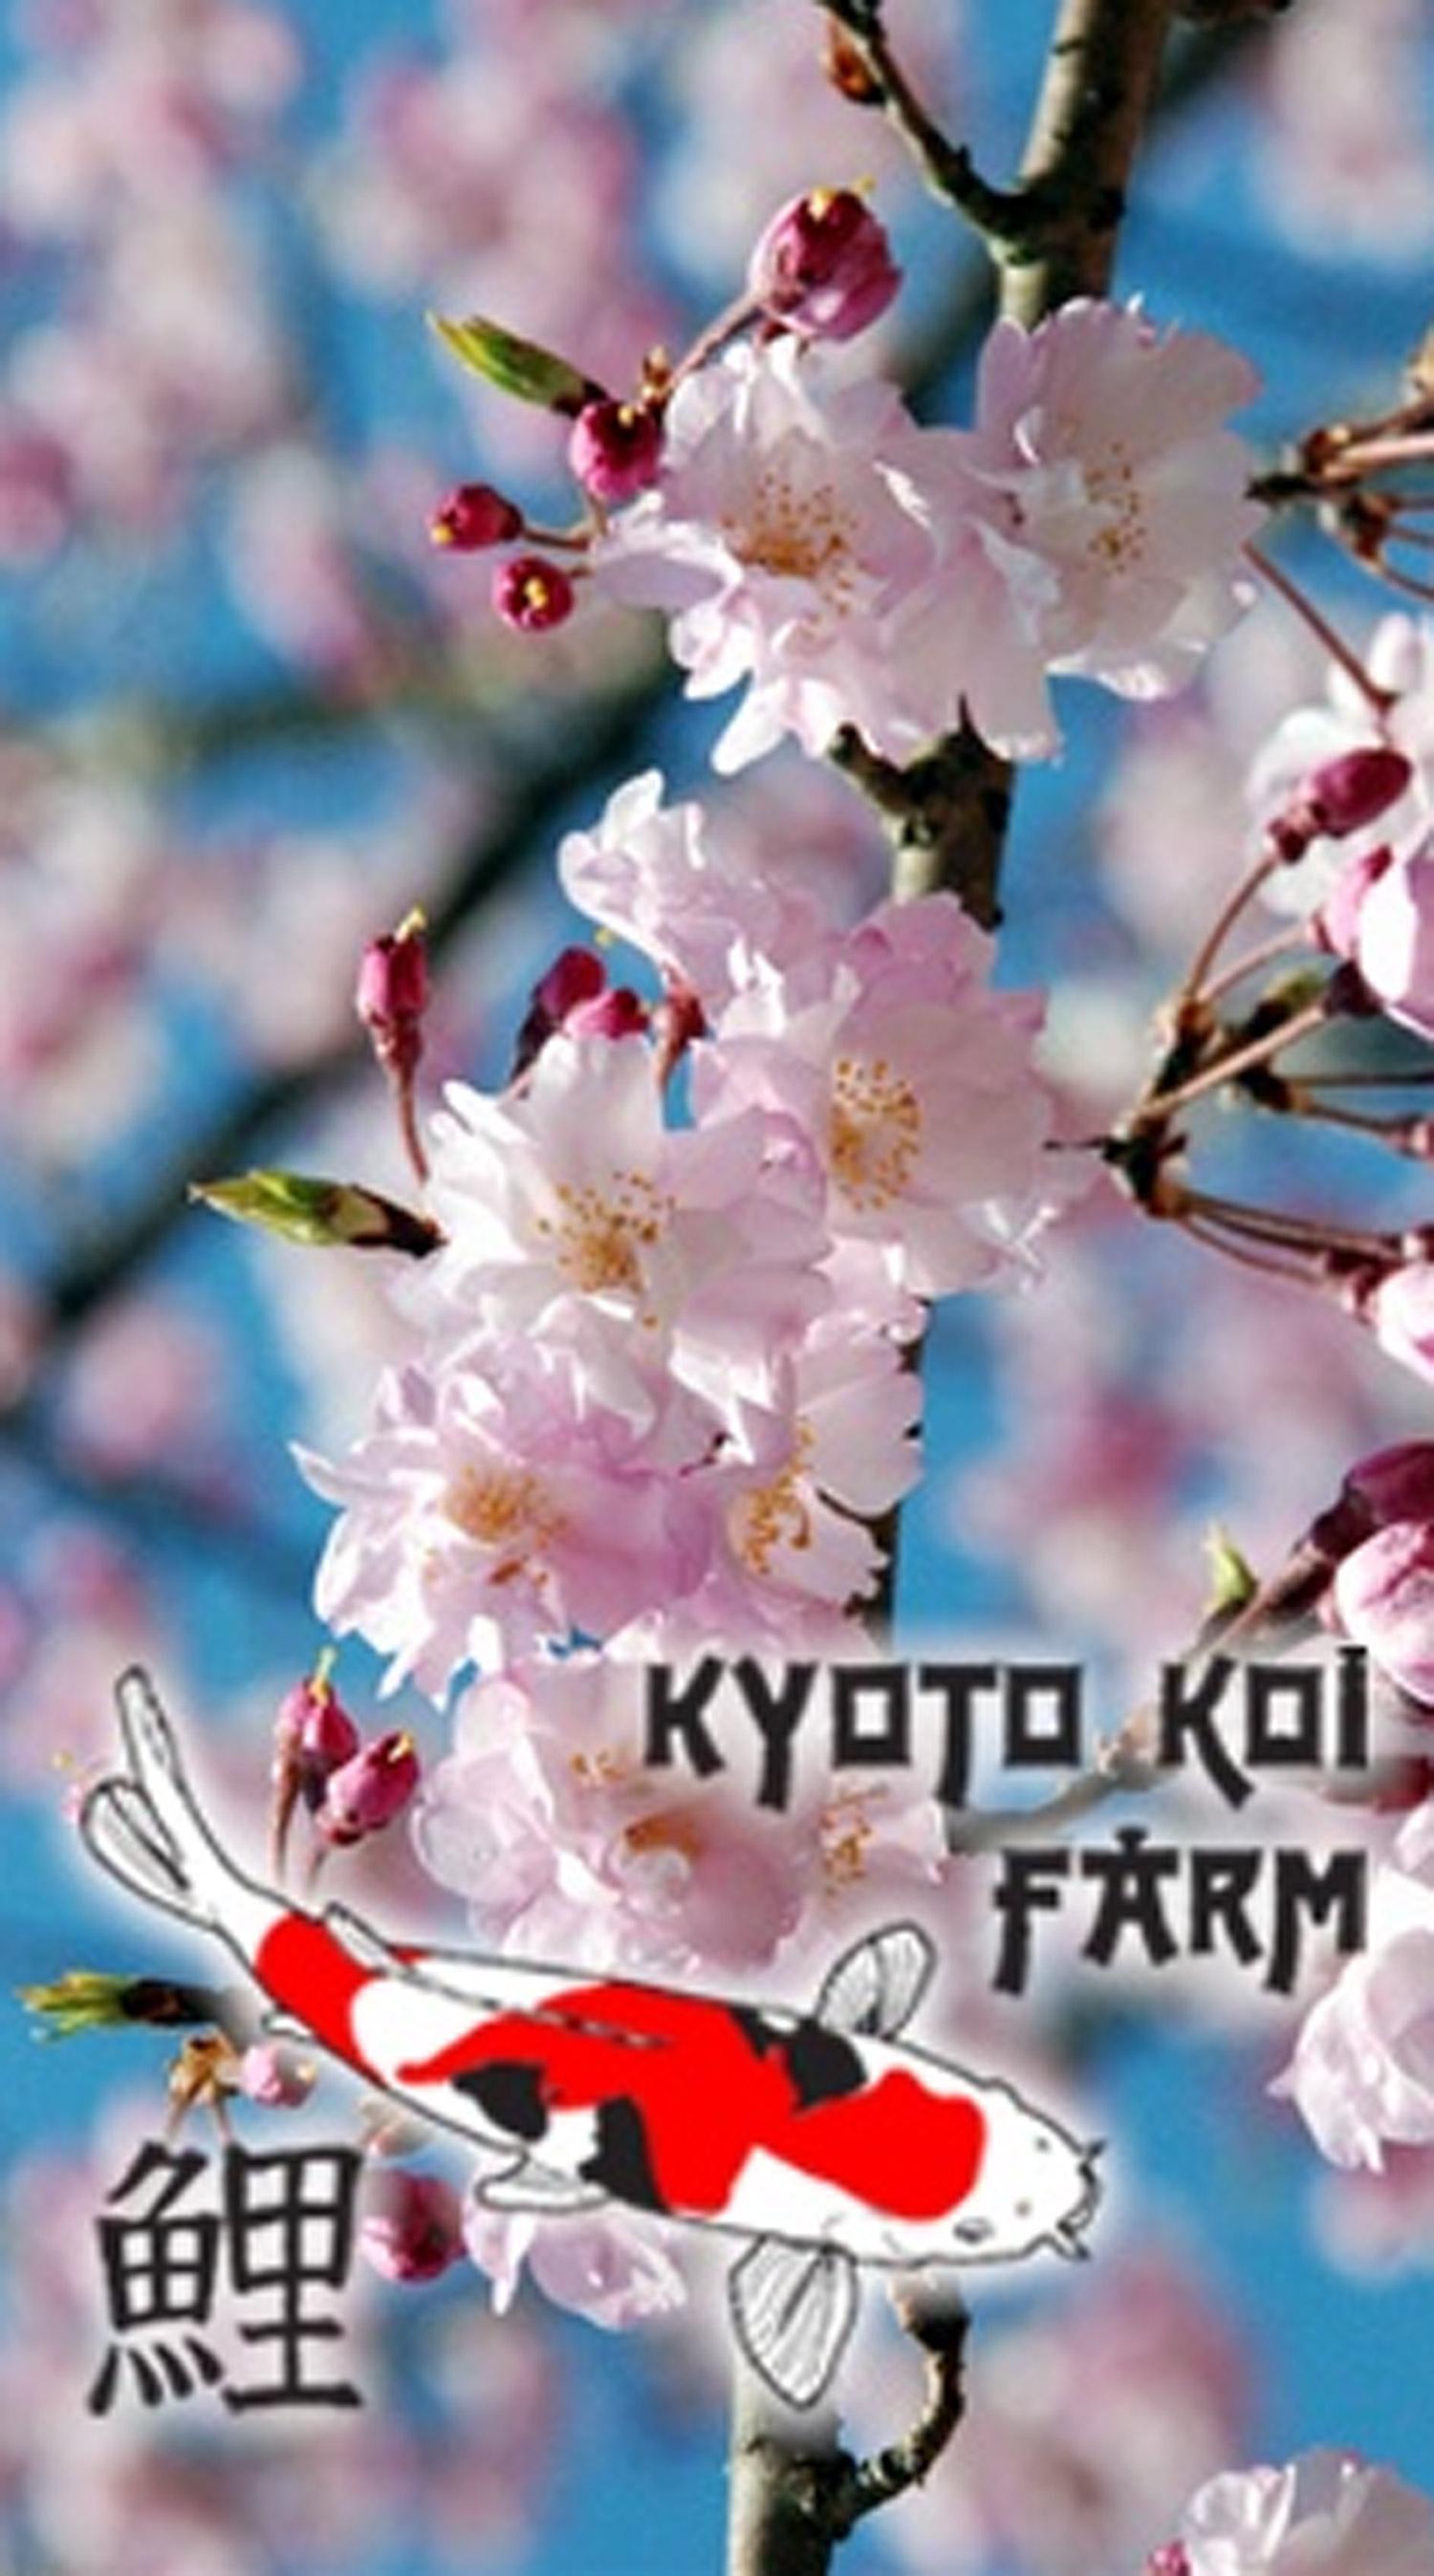 Kyoto-Koi-Farm.jpg